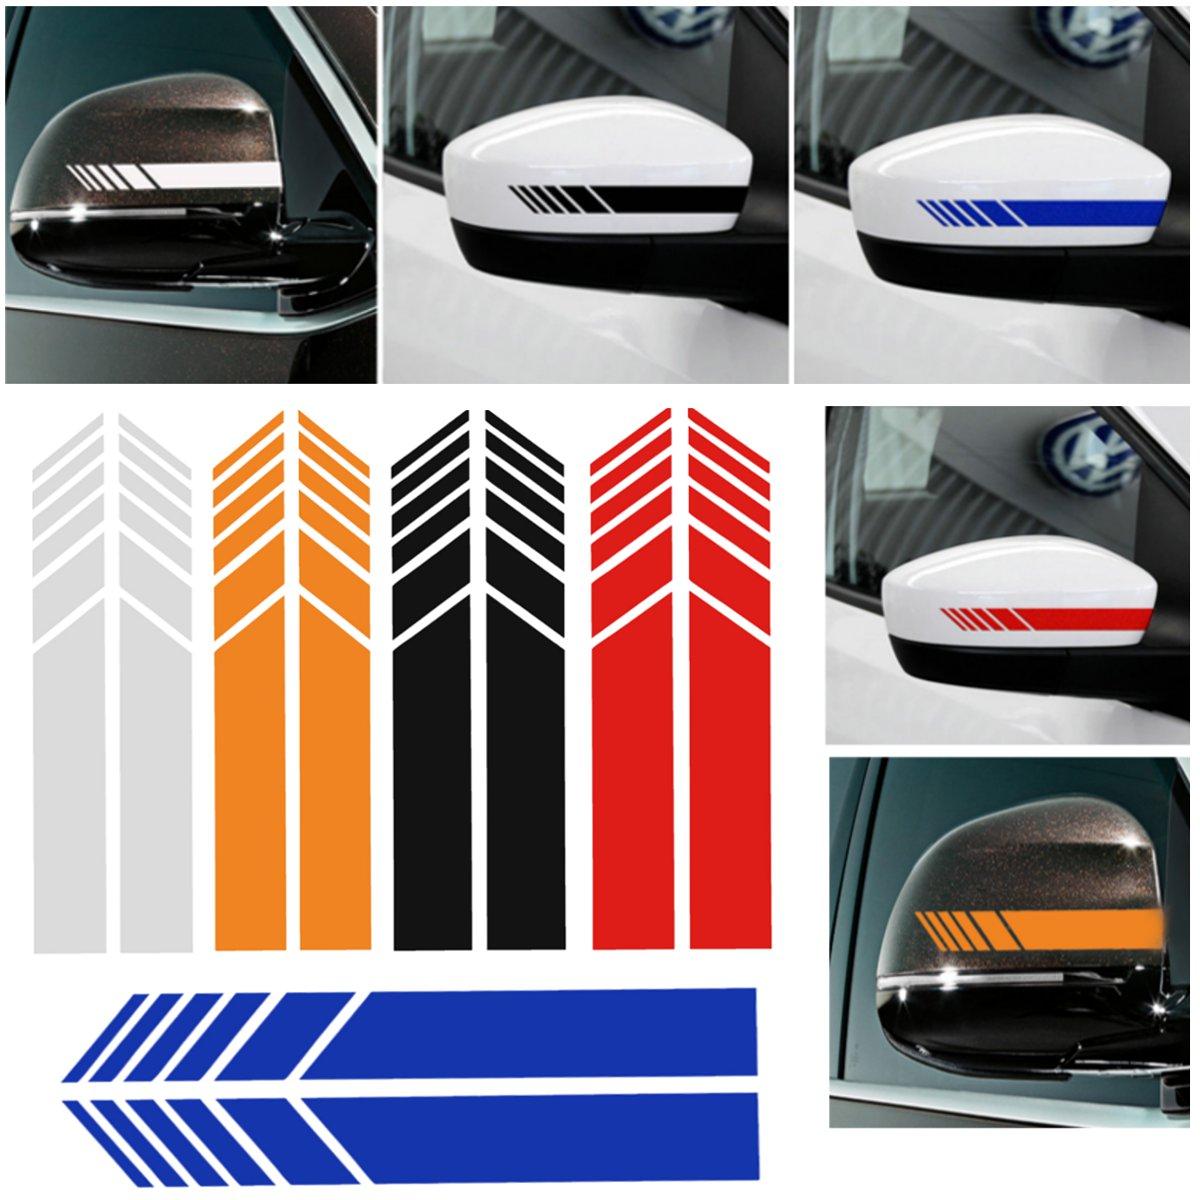 2pcs Car Rear View Mirror Cover Stickers Vinyl Stripe Decal Emblem KK for Mercedes